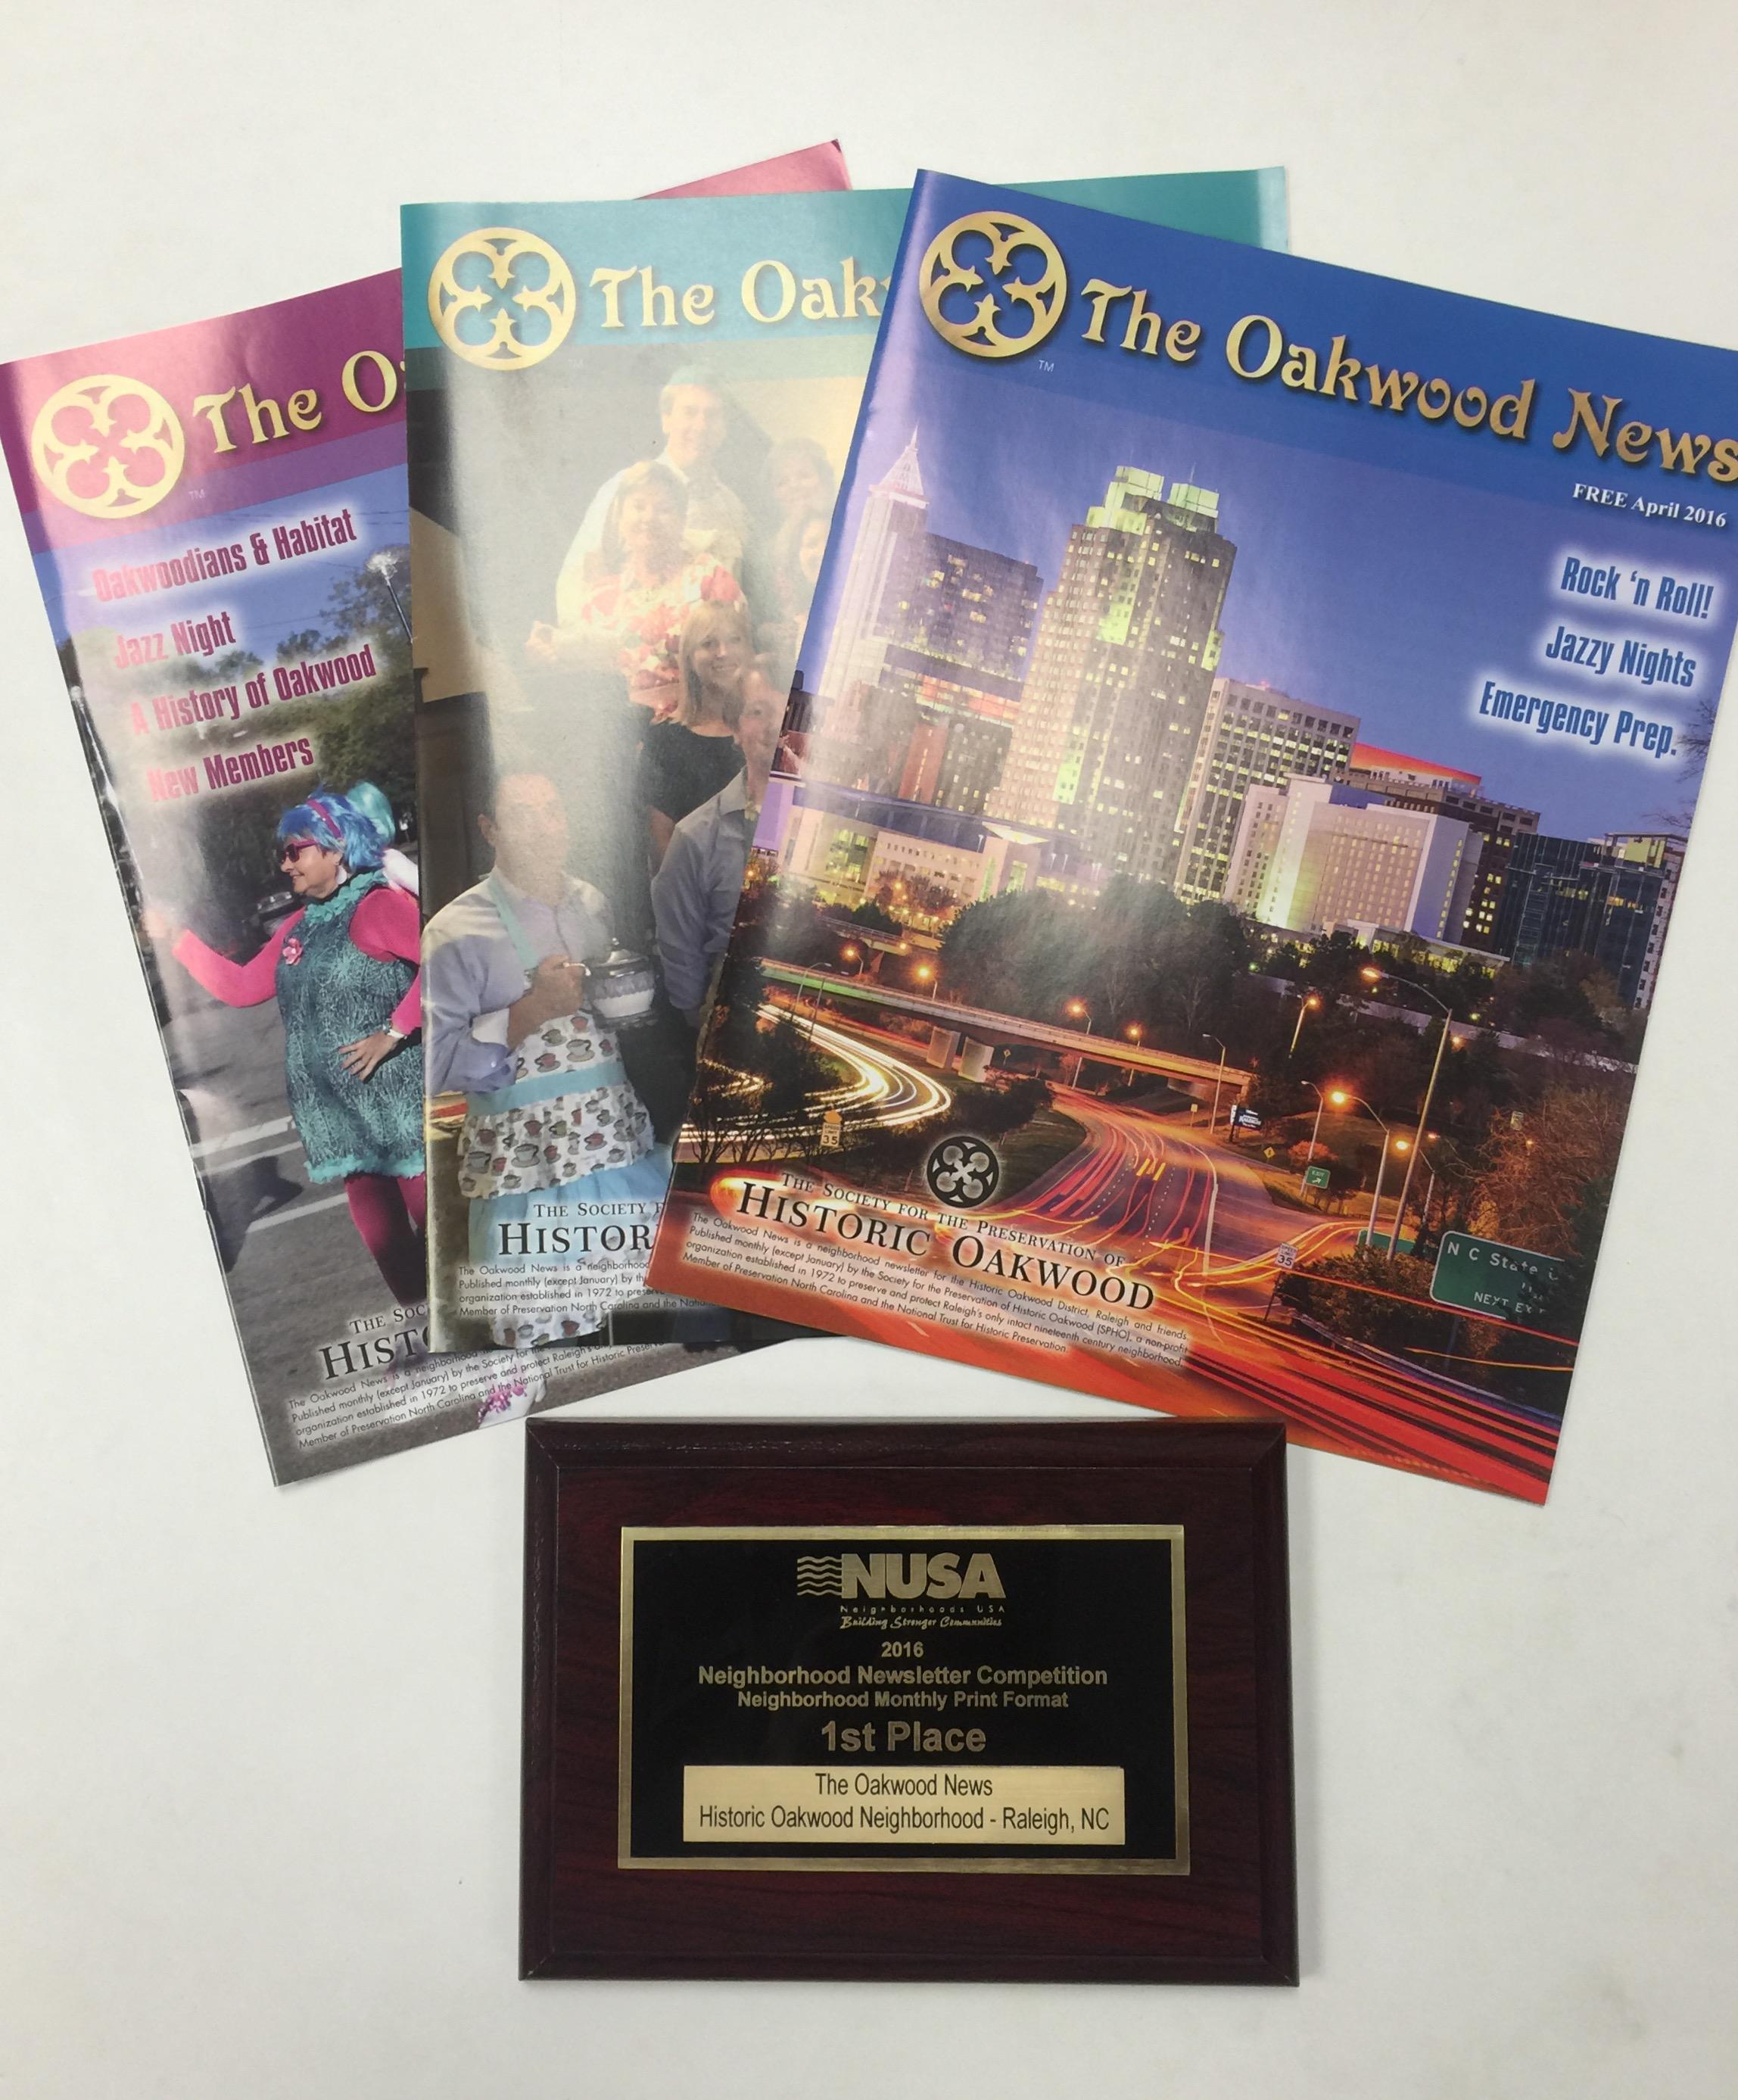 The Oakwood News 1st Place Winner - Best Printed Neighborhood Newsletter by Neighborhoods USA, 2016